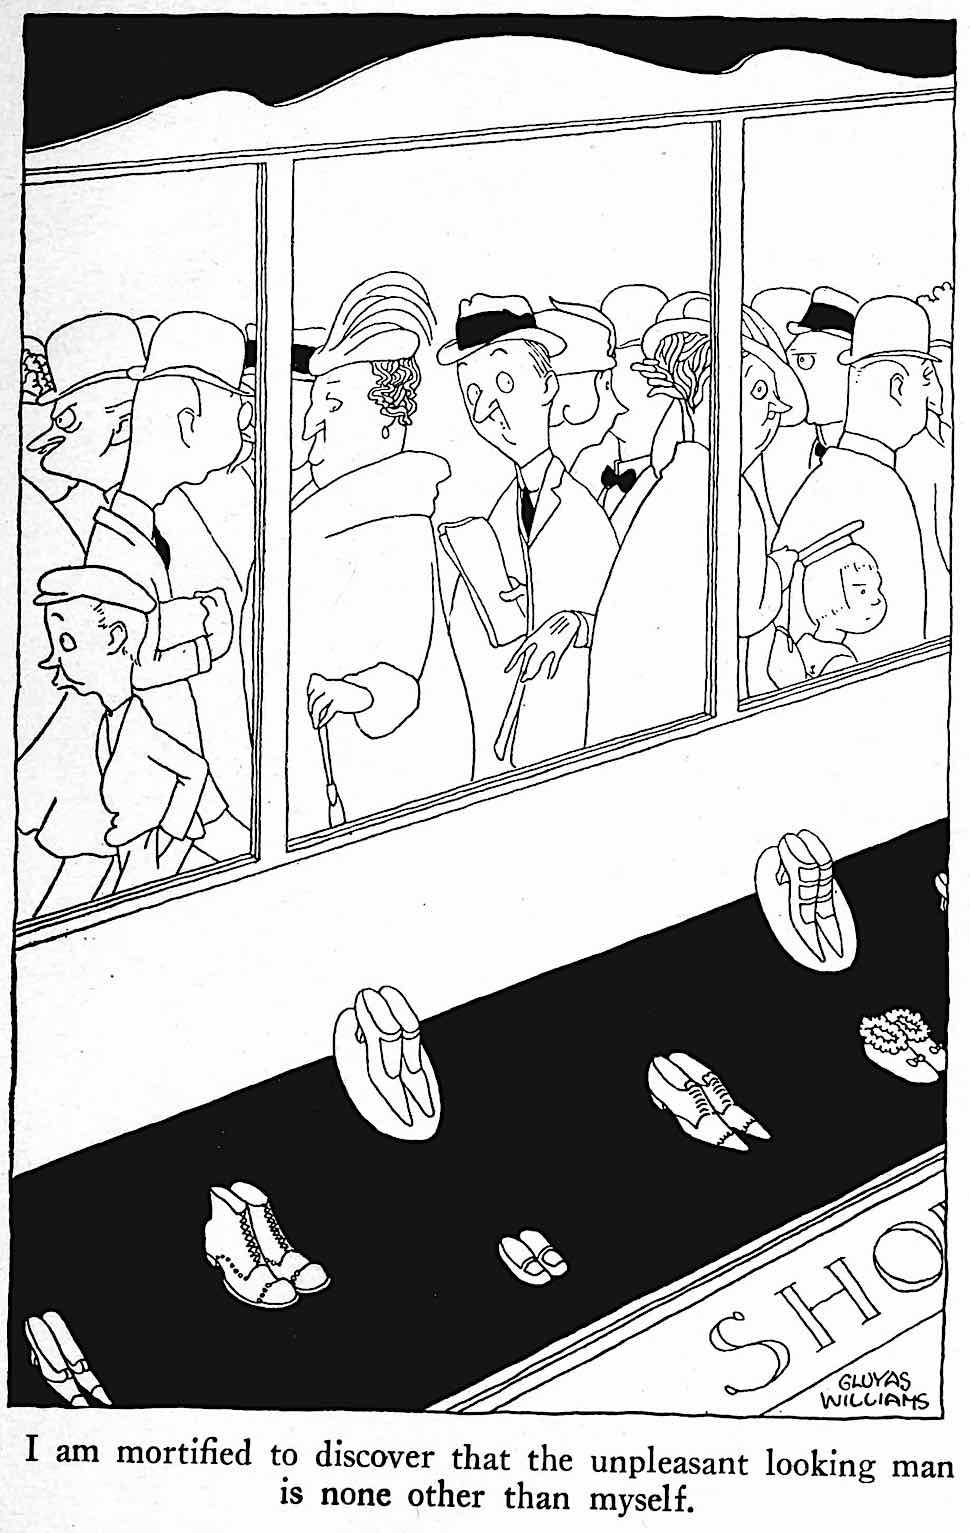 a Gluyas Williams cartoon about a self-conscious man in public